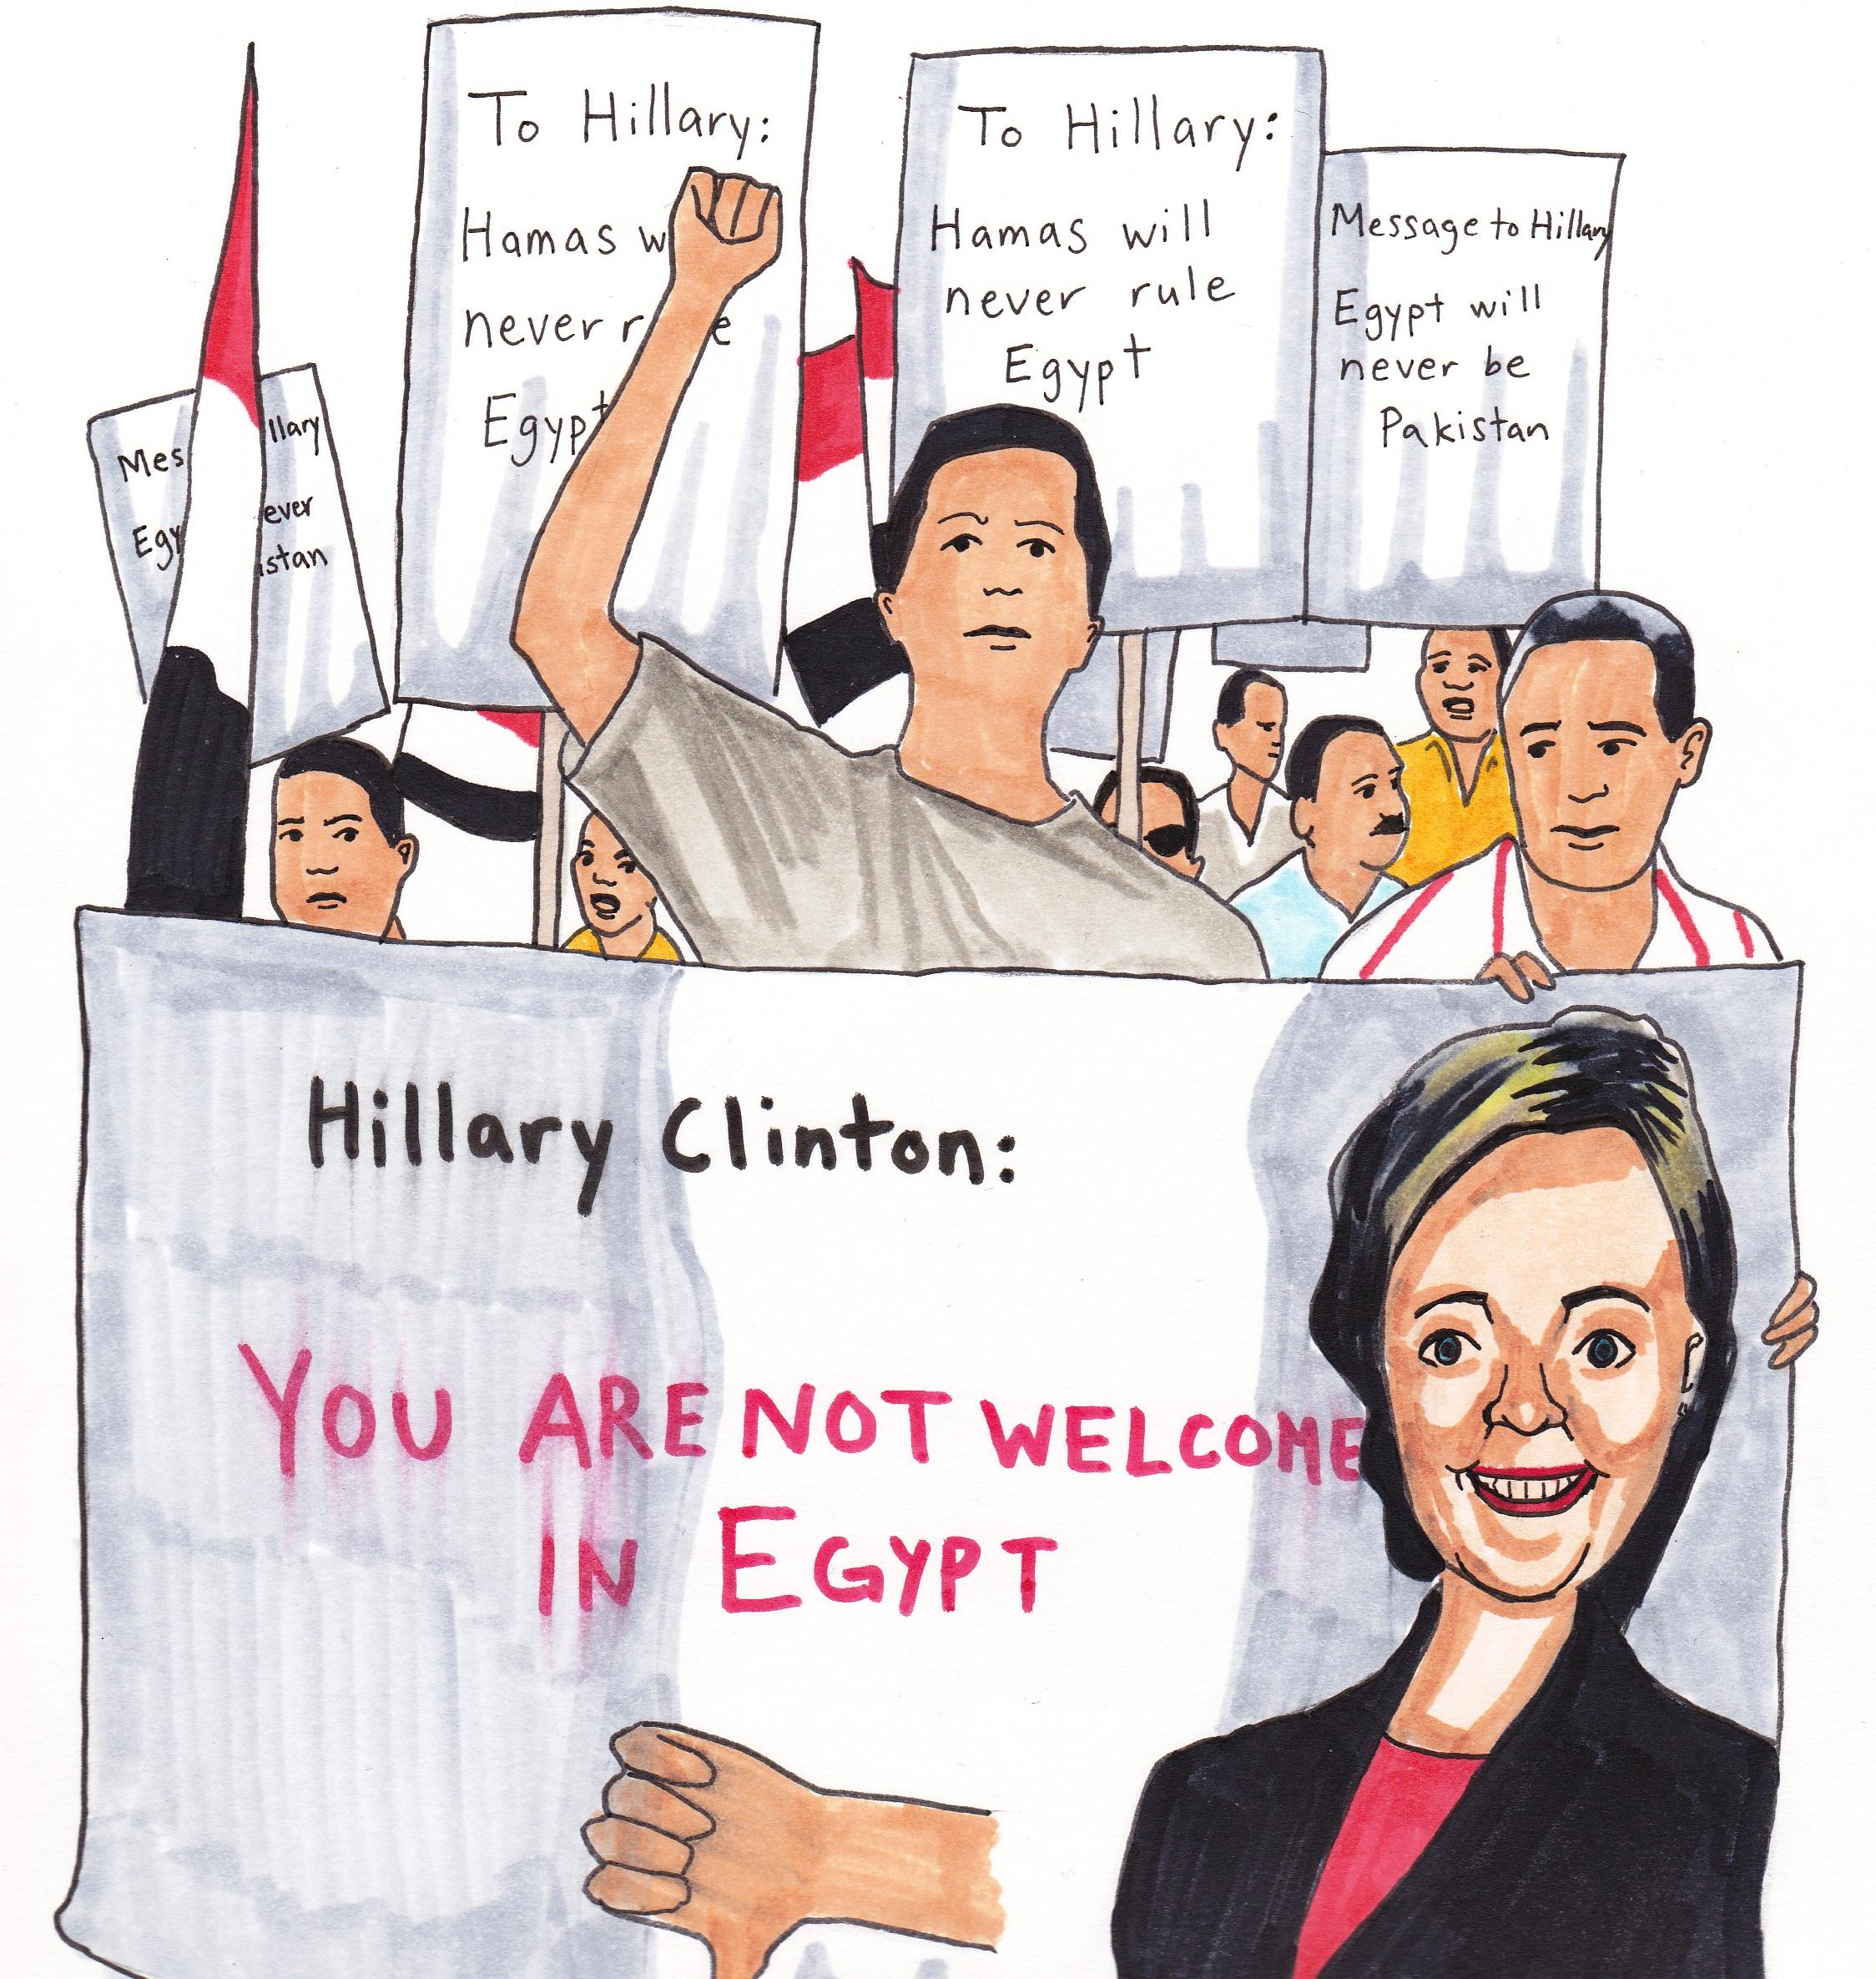 ClintonProtest.jpg